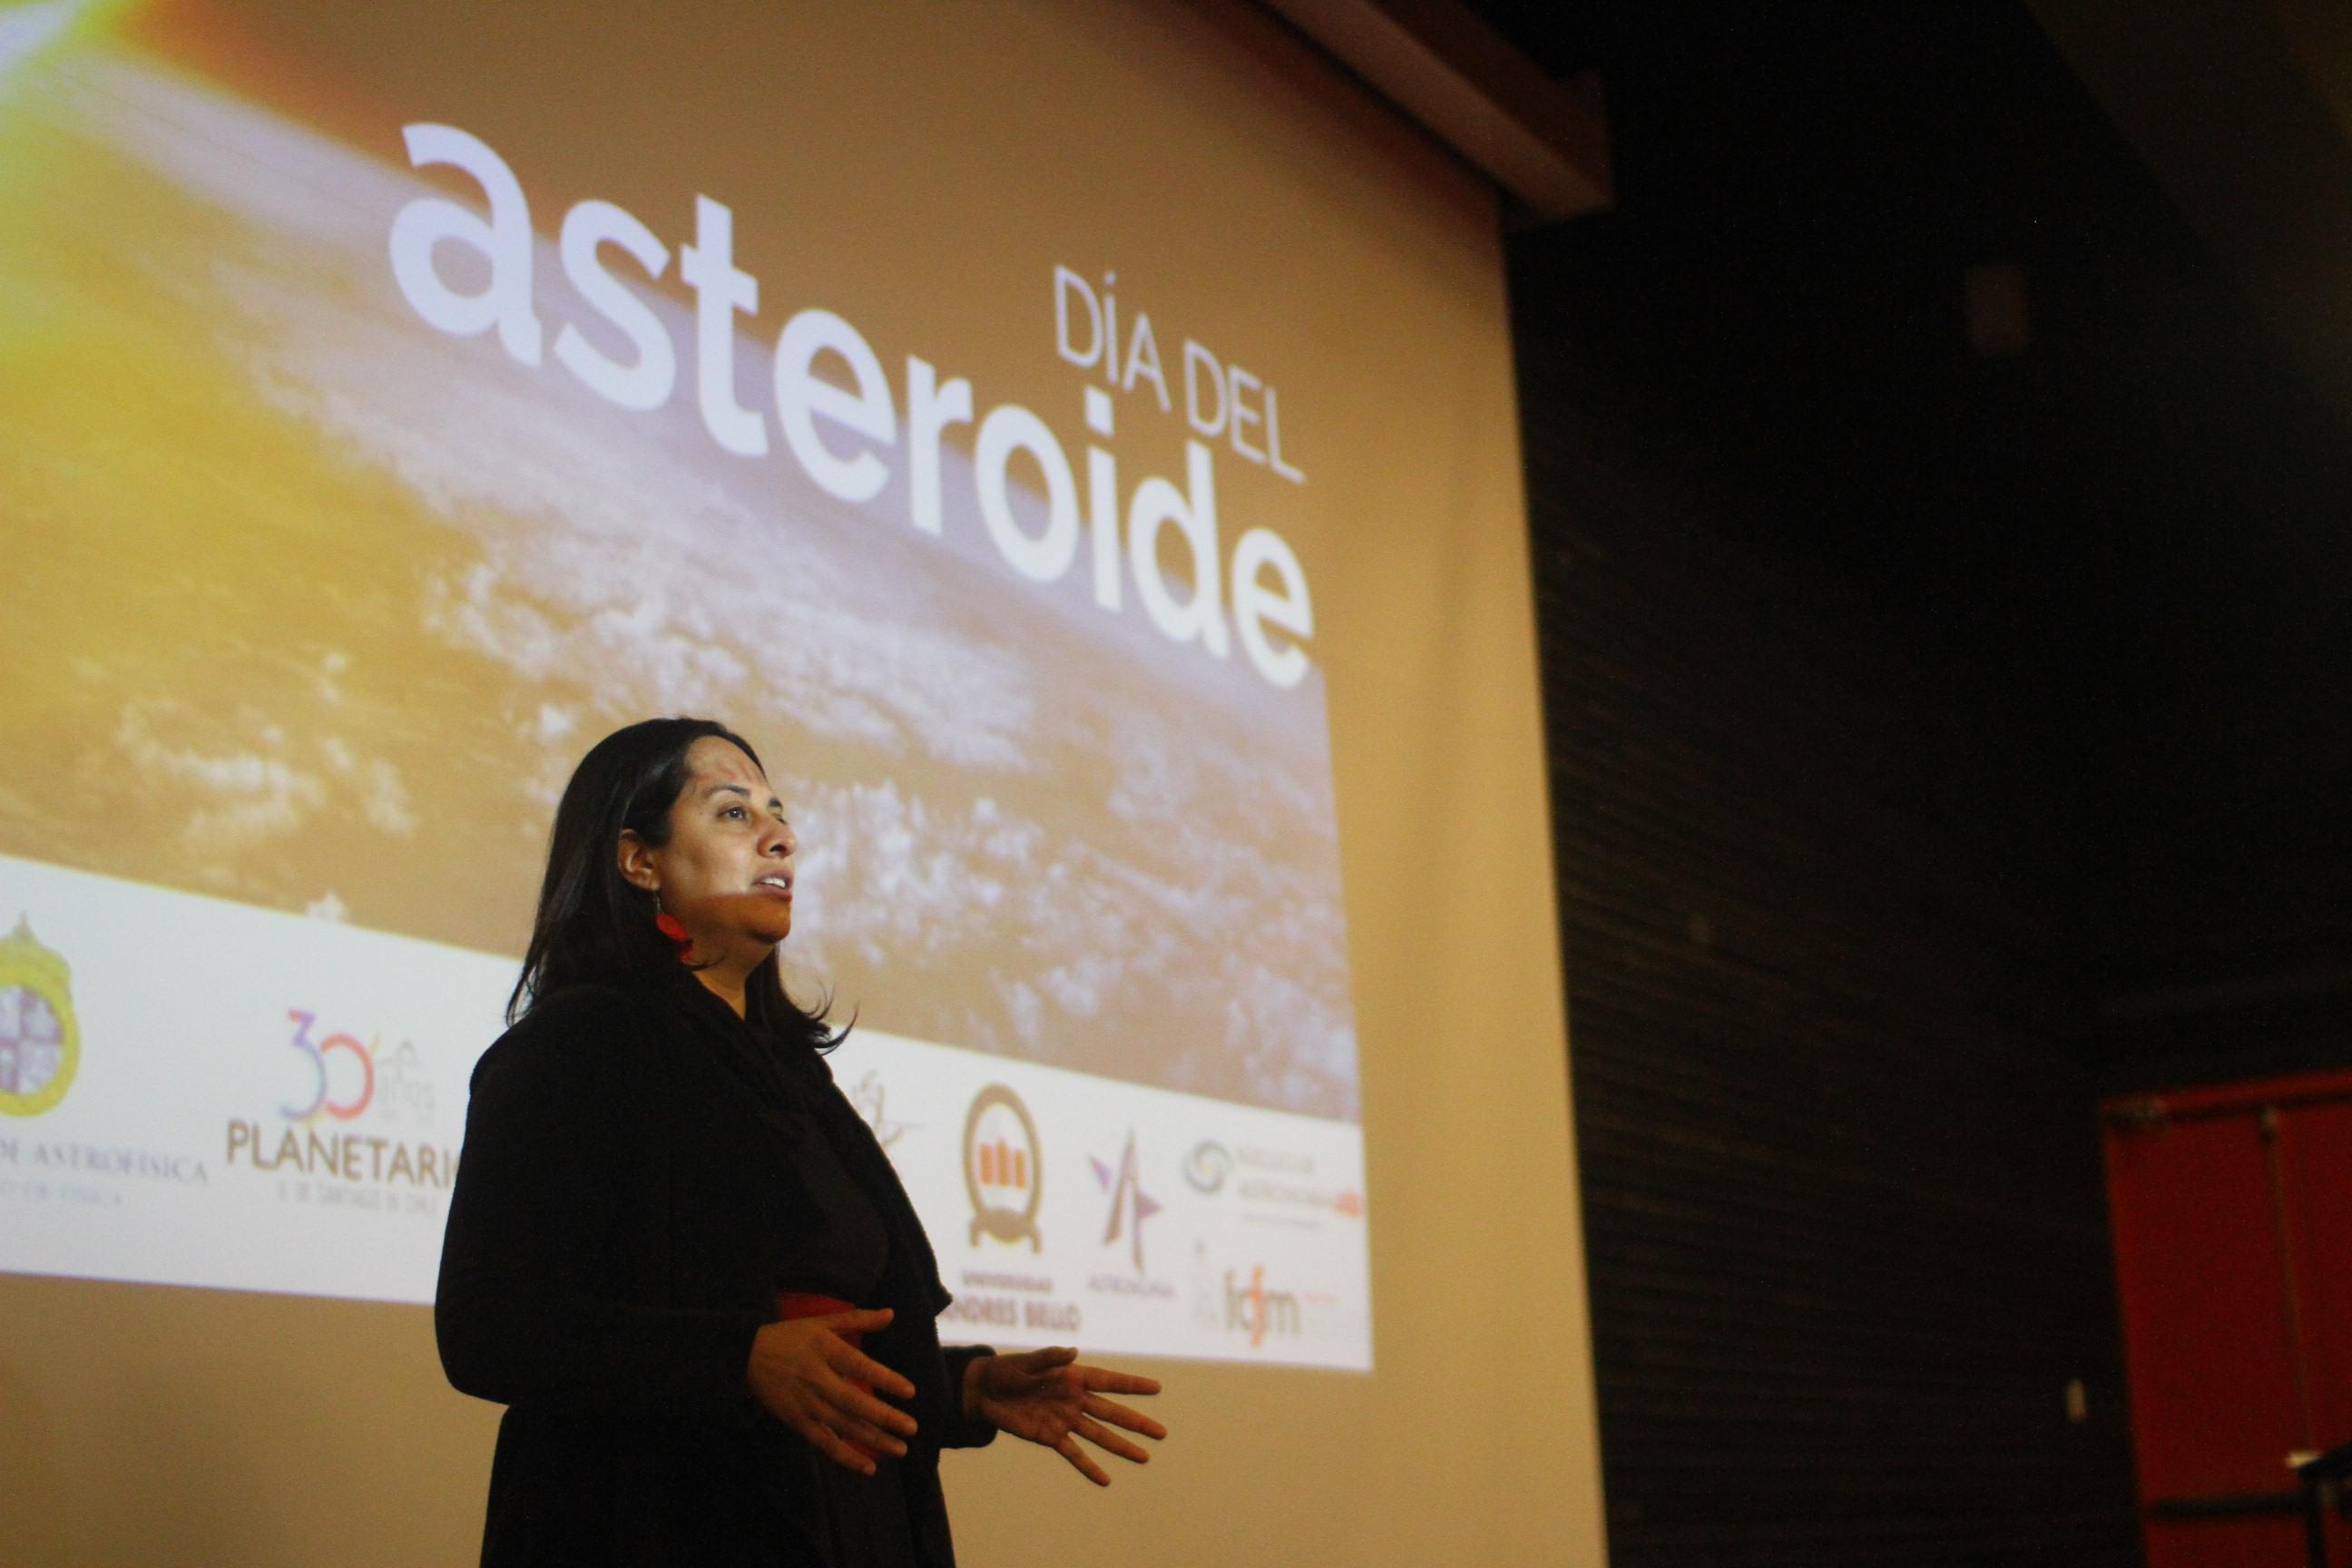 Núcleo de Astronomía UDP celebra Día Mundial del Asteroide